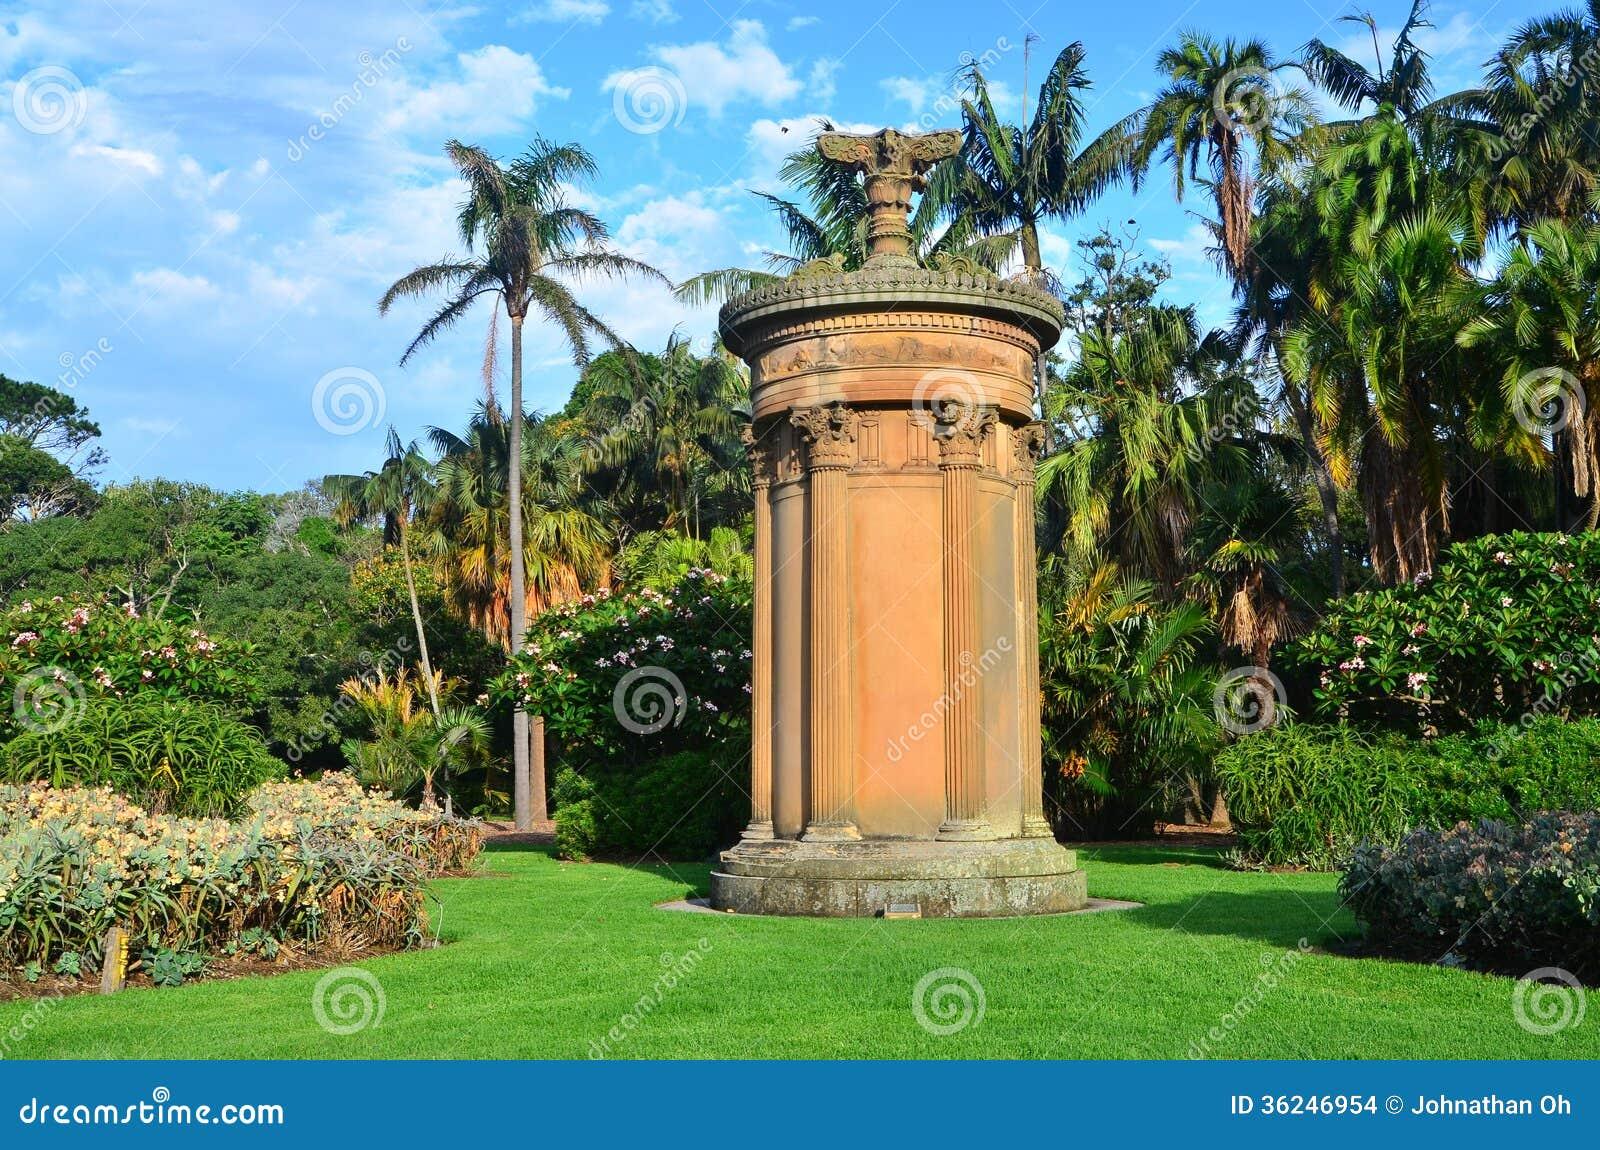 Sydney Royal Botanical Garden